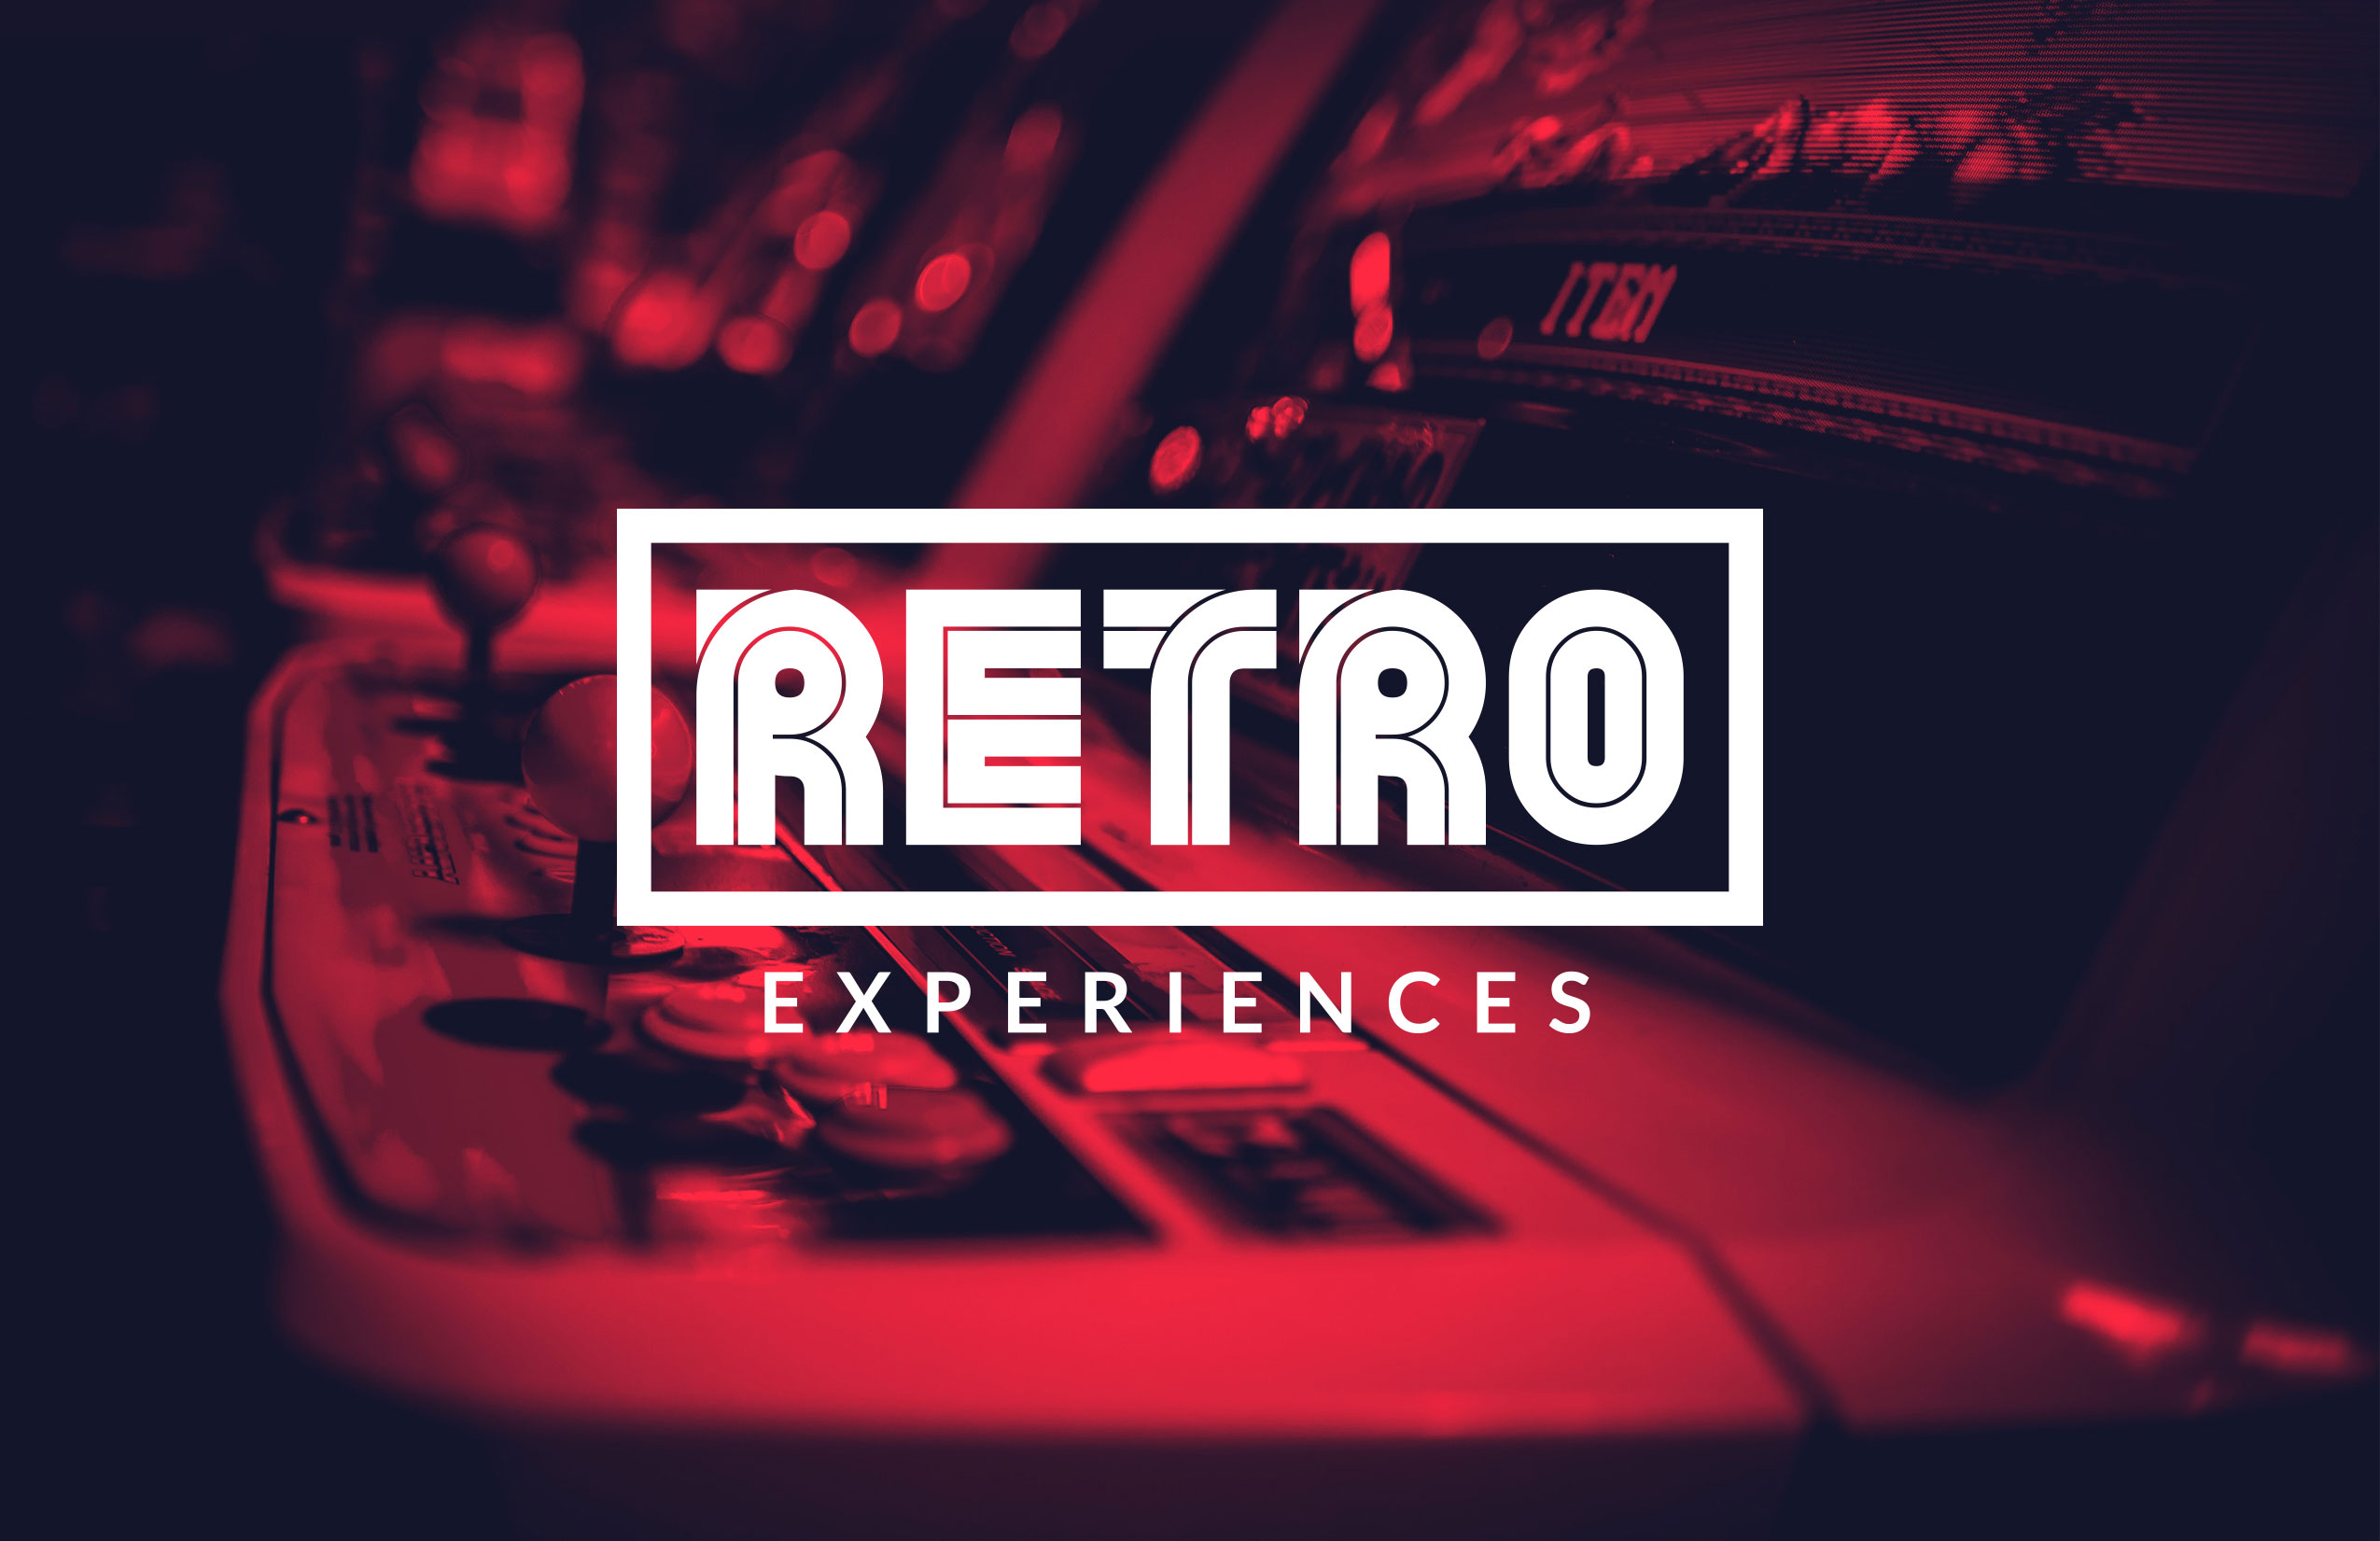 Retro Experiences